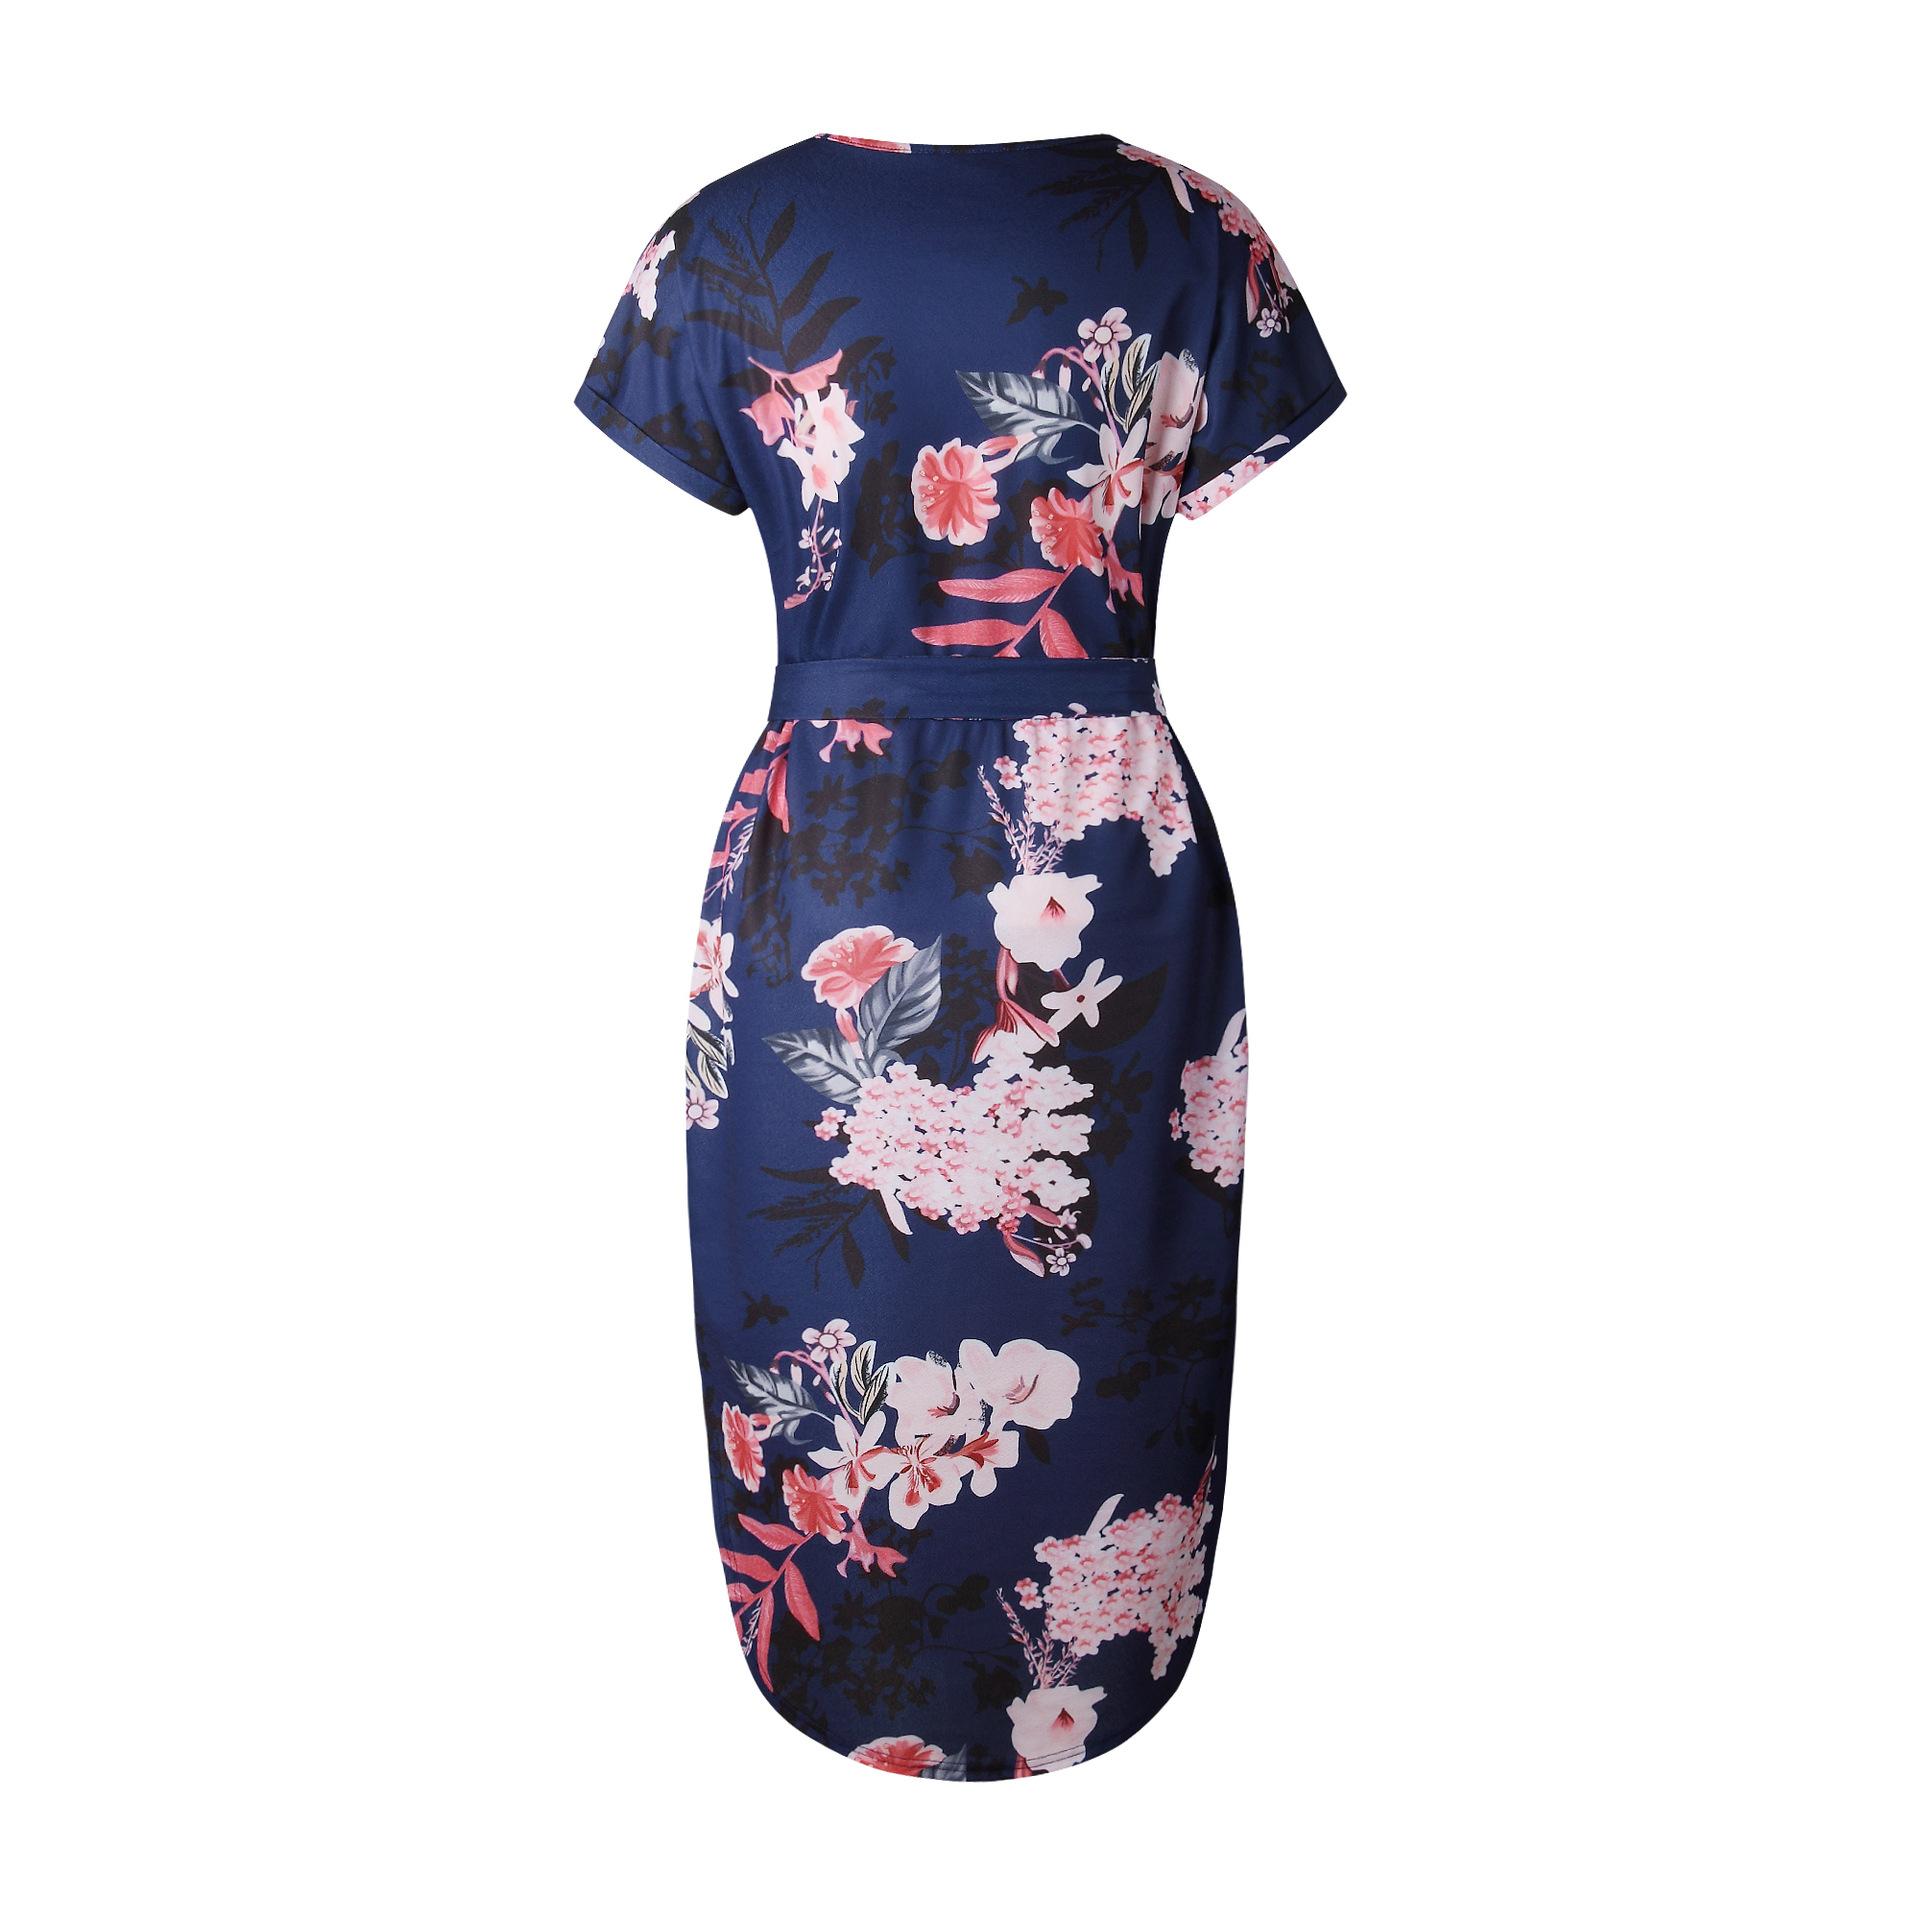 2018 Summer Dress Women Print V Neck Short Sleeve Robe Female Dresses Casual Sashes Midi Dress Ladies Elegant Vestidos Dropship 32